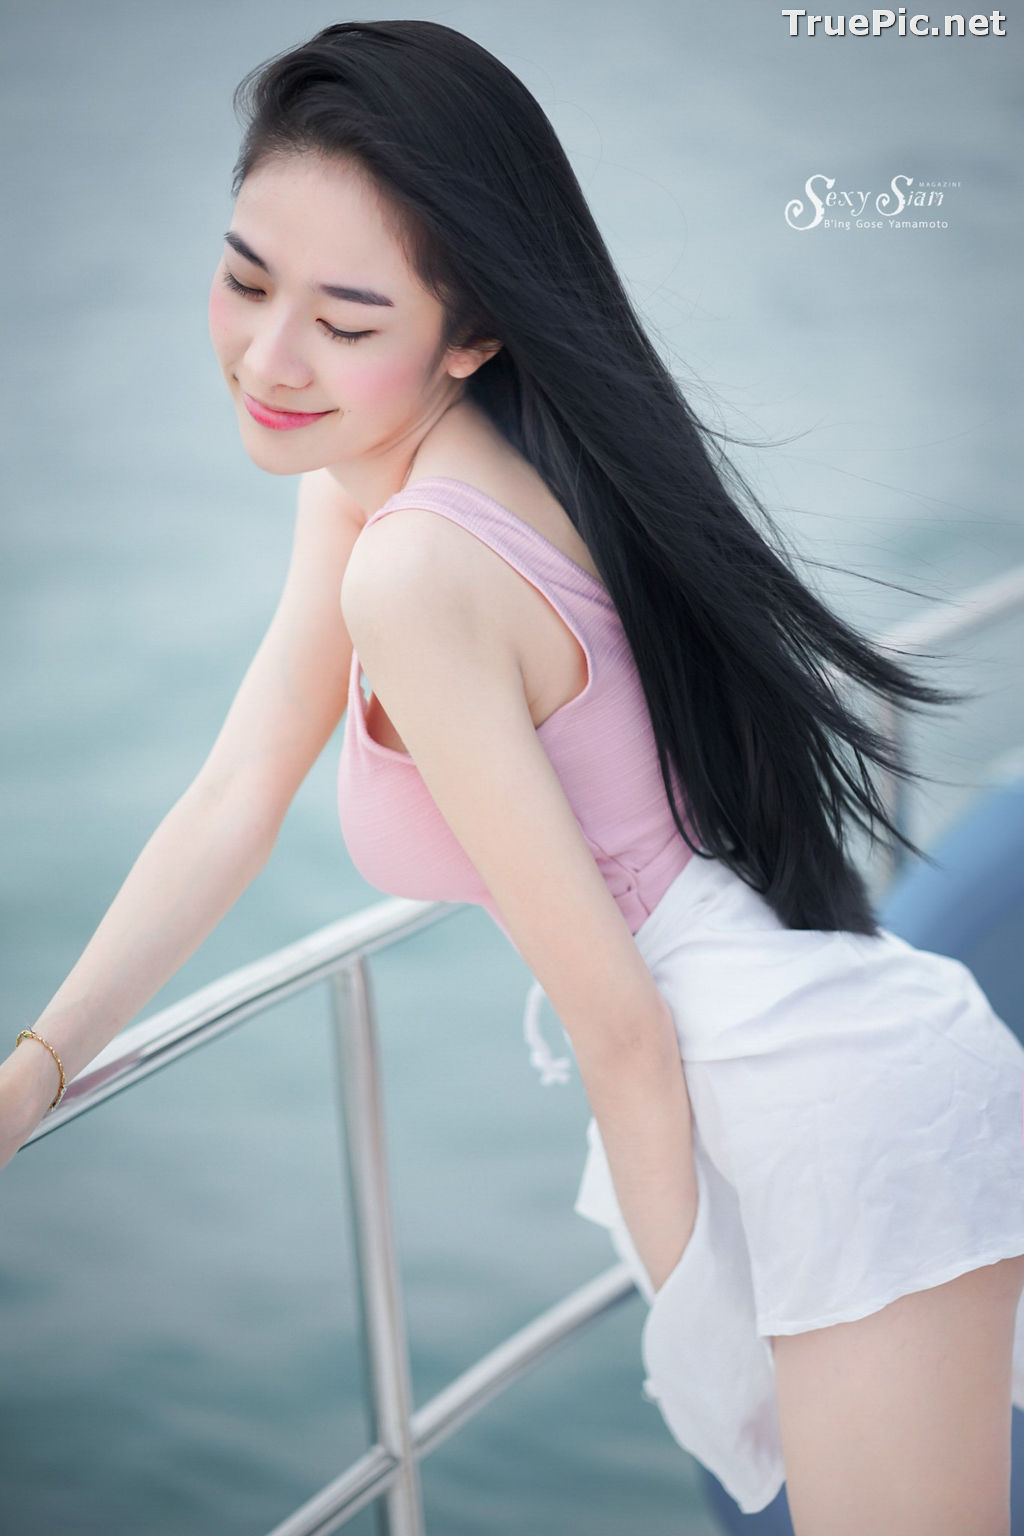 Image Thailand Model - Patcharin Srikunchai - Pink Monokini and Jean Pants - TruePic.net - Picture-3